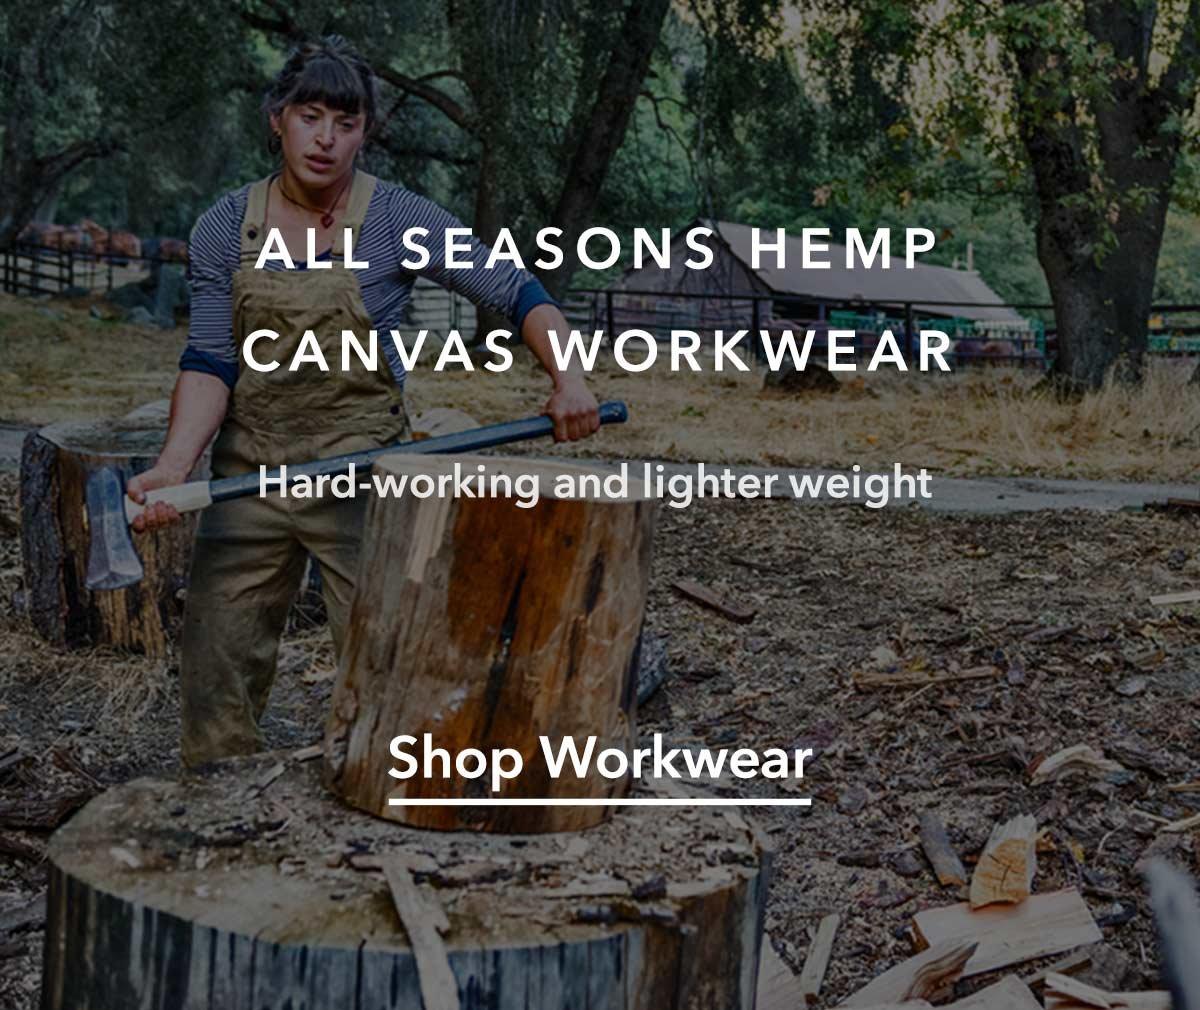 All Seasons Hemp Canvas Workwear. Shop Workwear.